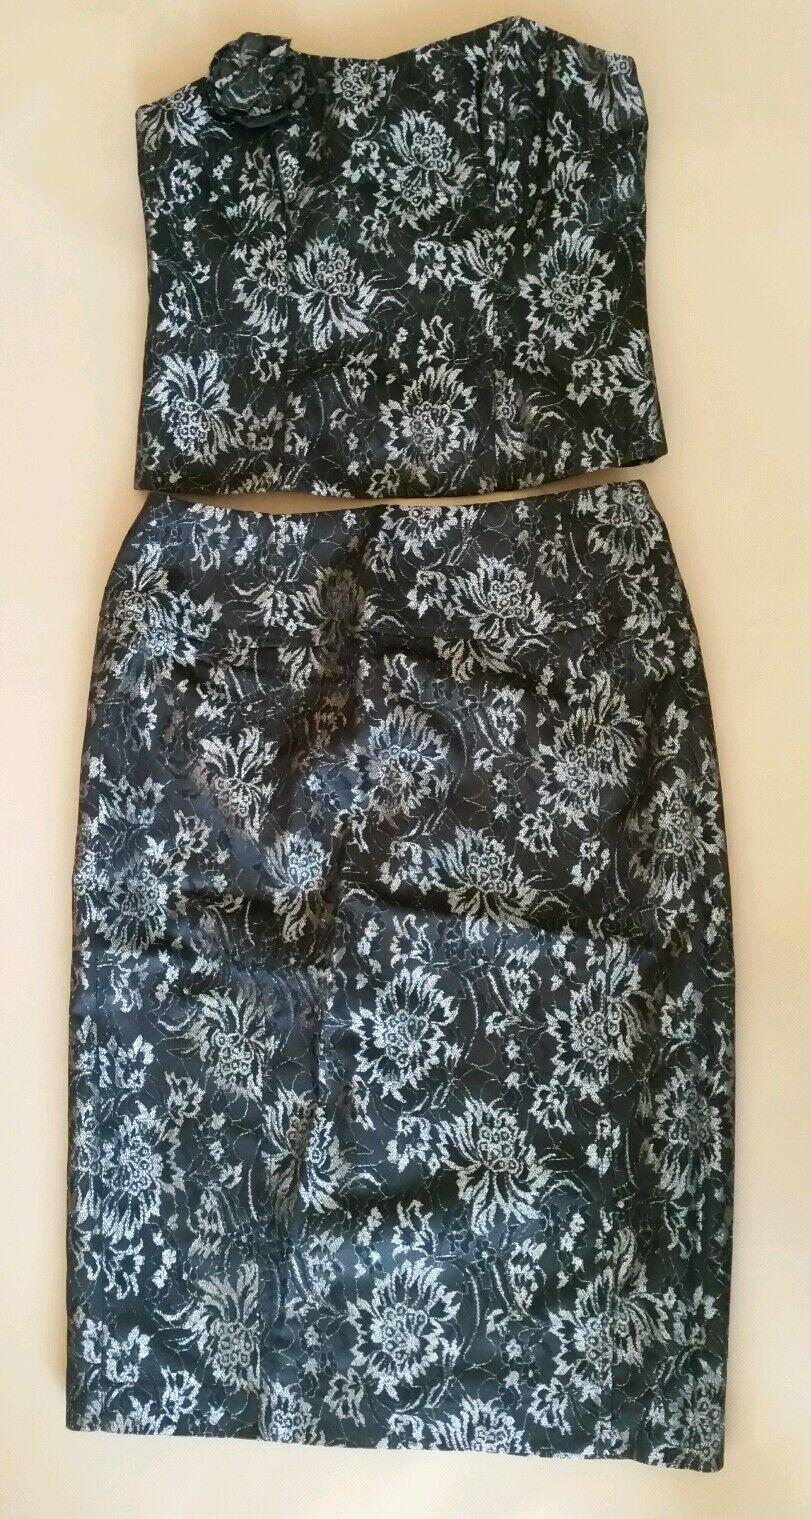 Ladies Evening Skirt And Bodice Set, Next, Size 8